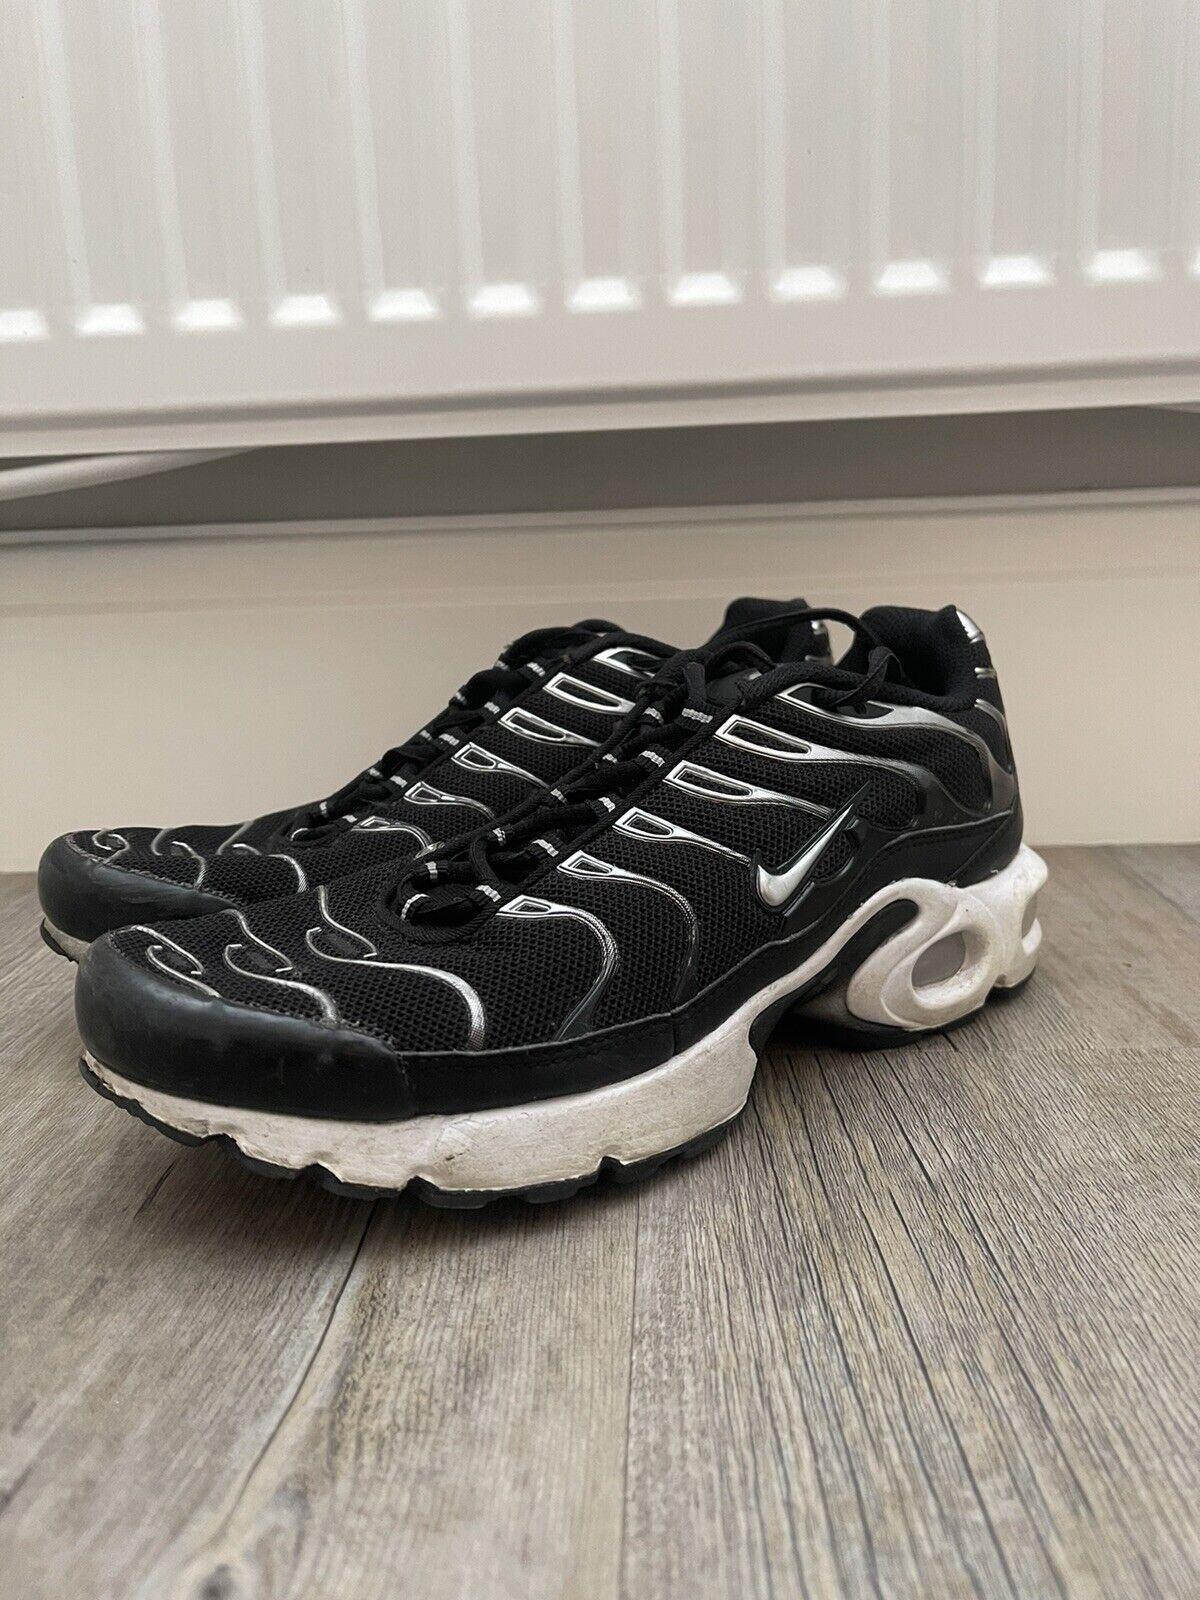 Men's Black Nike Air Max TN Tuned 1 UK 6